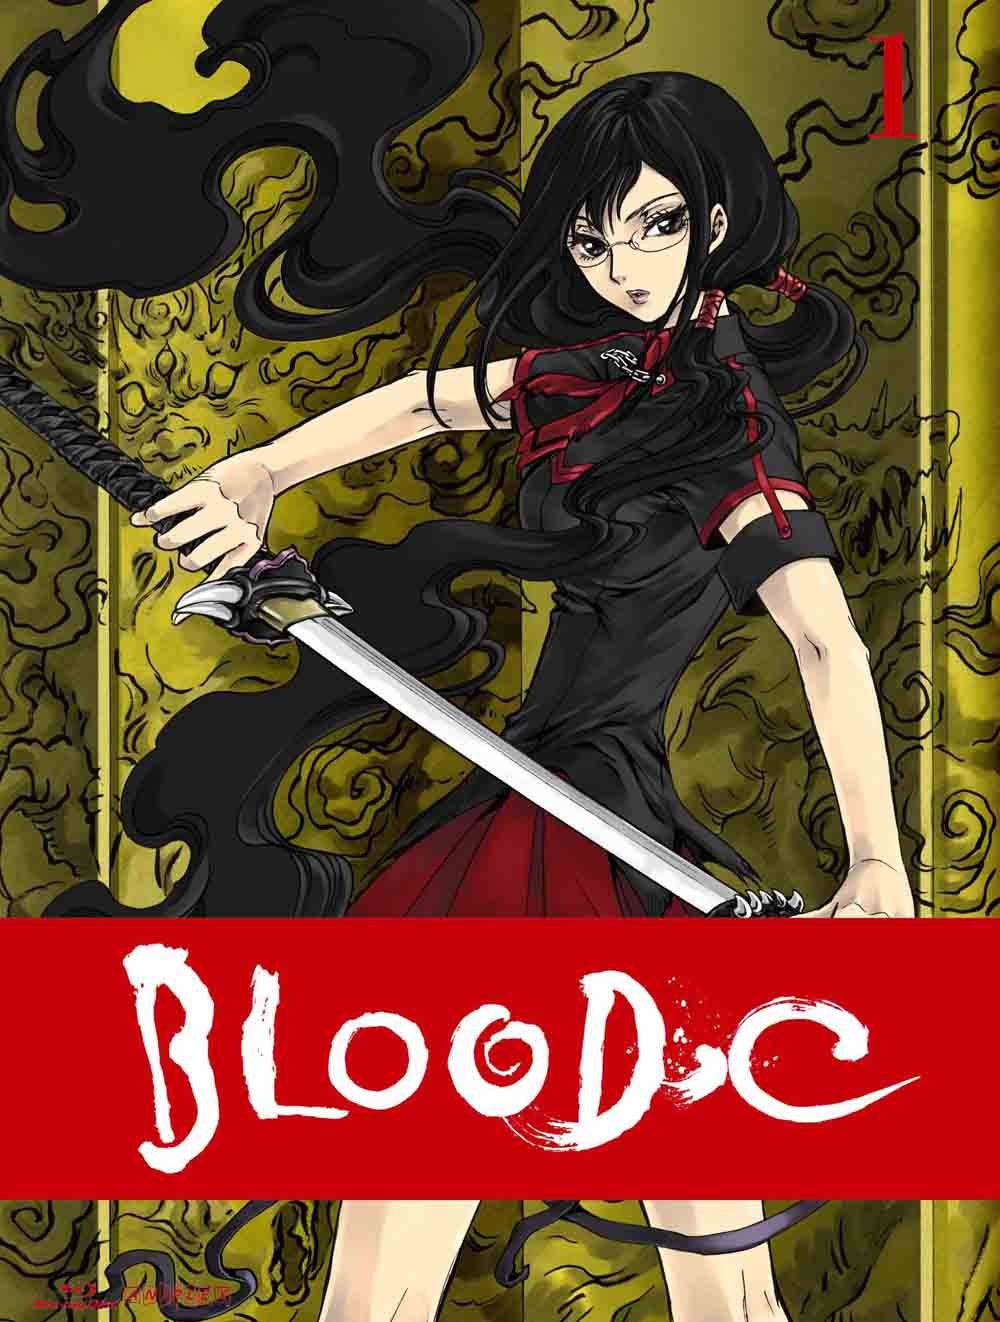 Presenting: Blood-C Cover_blood_c_01_jp